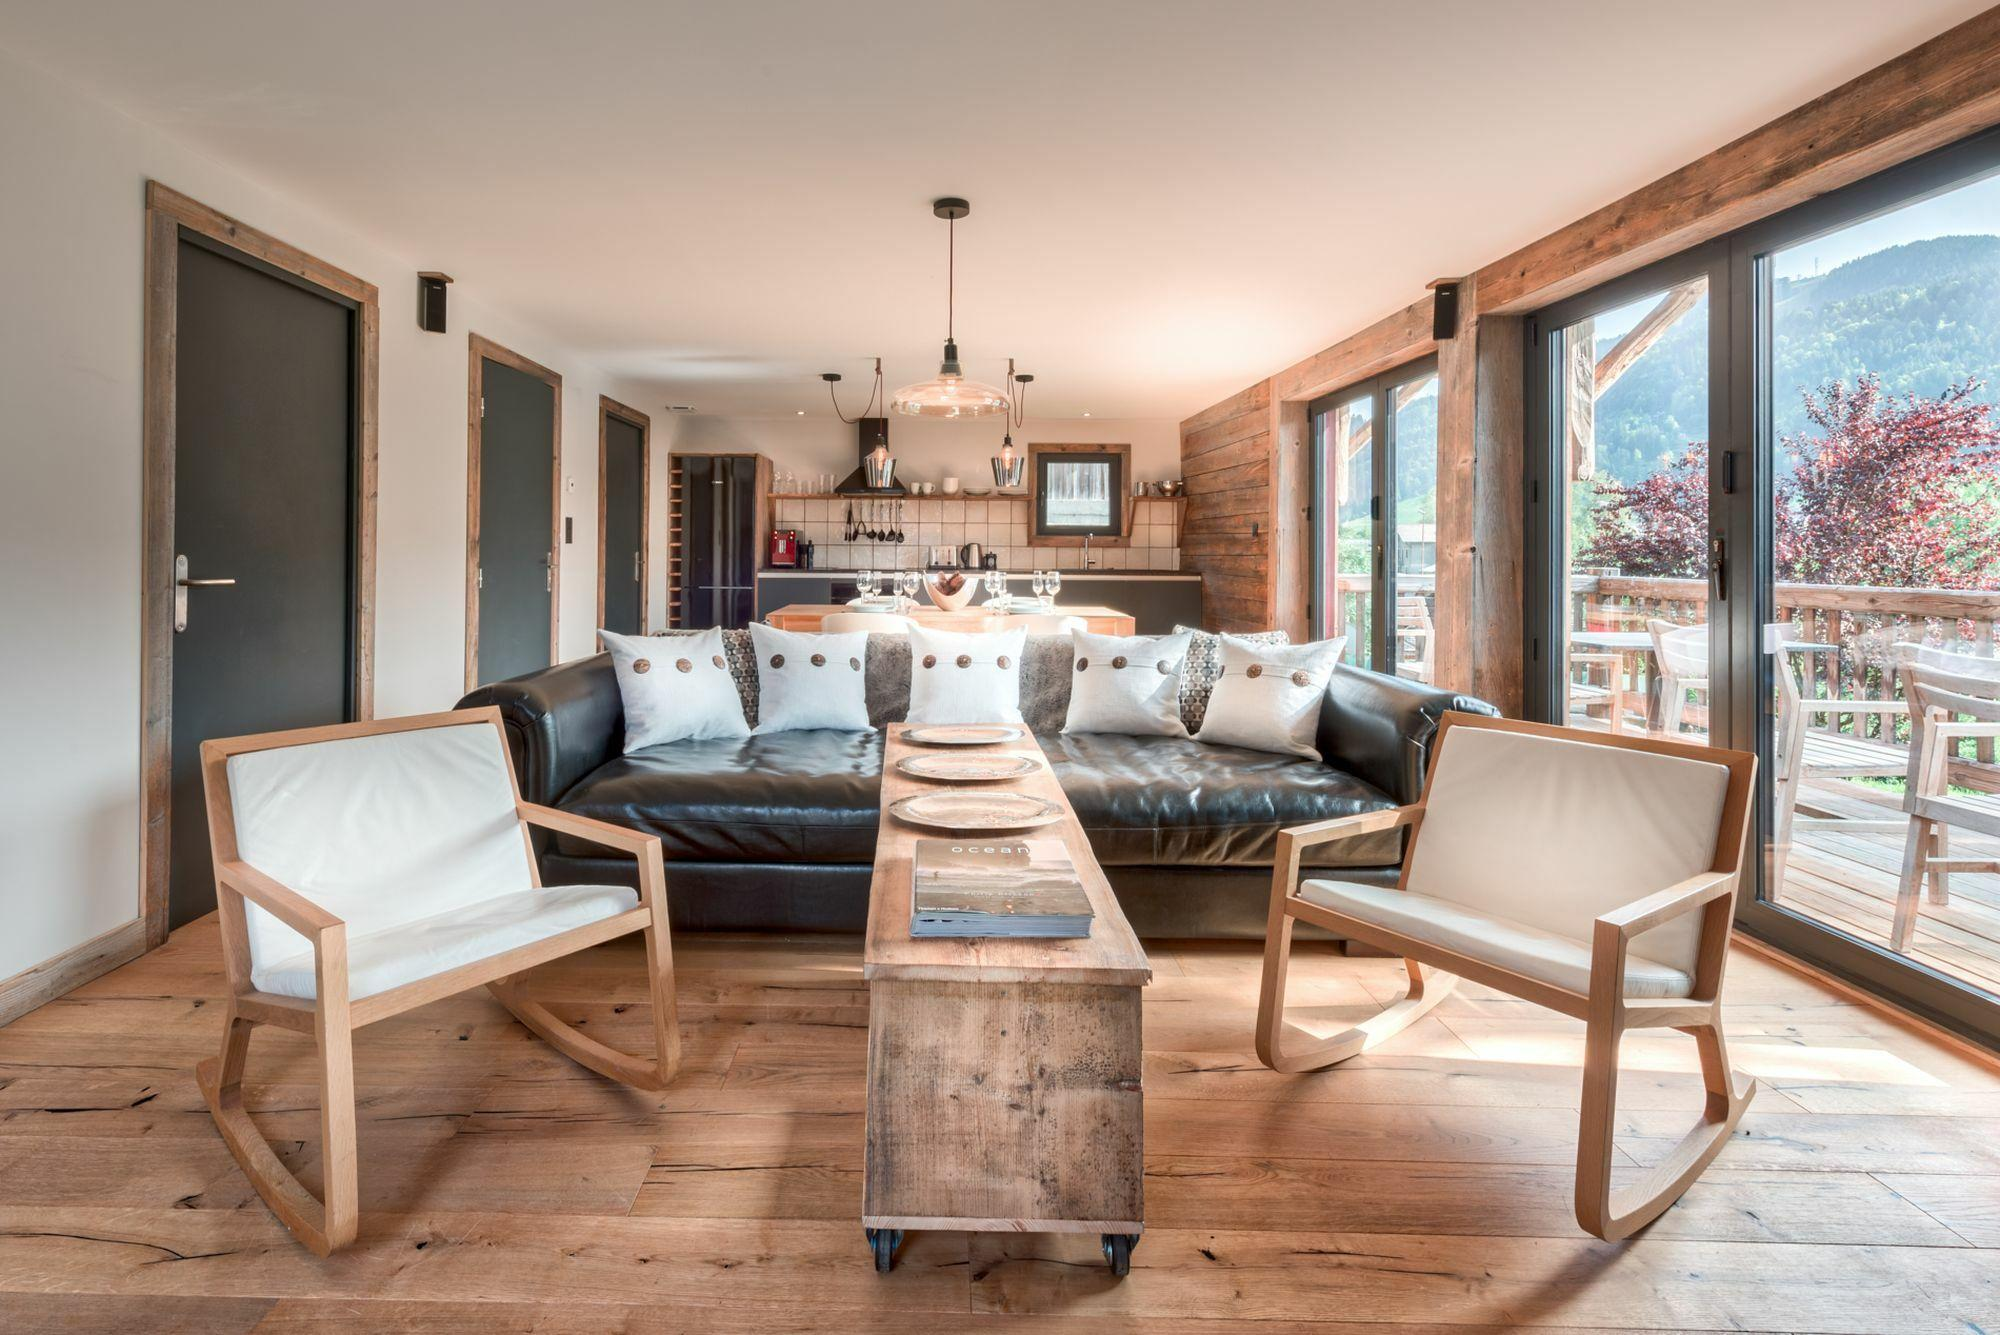 Deux Chevaux Accommodation in Morzine